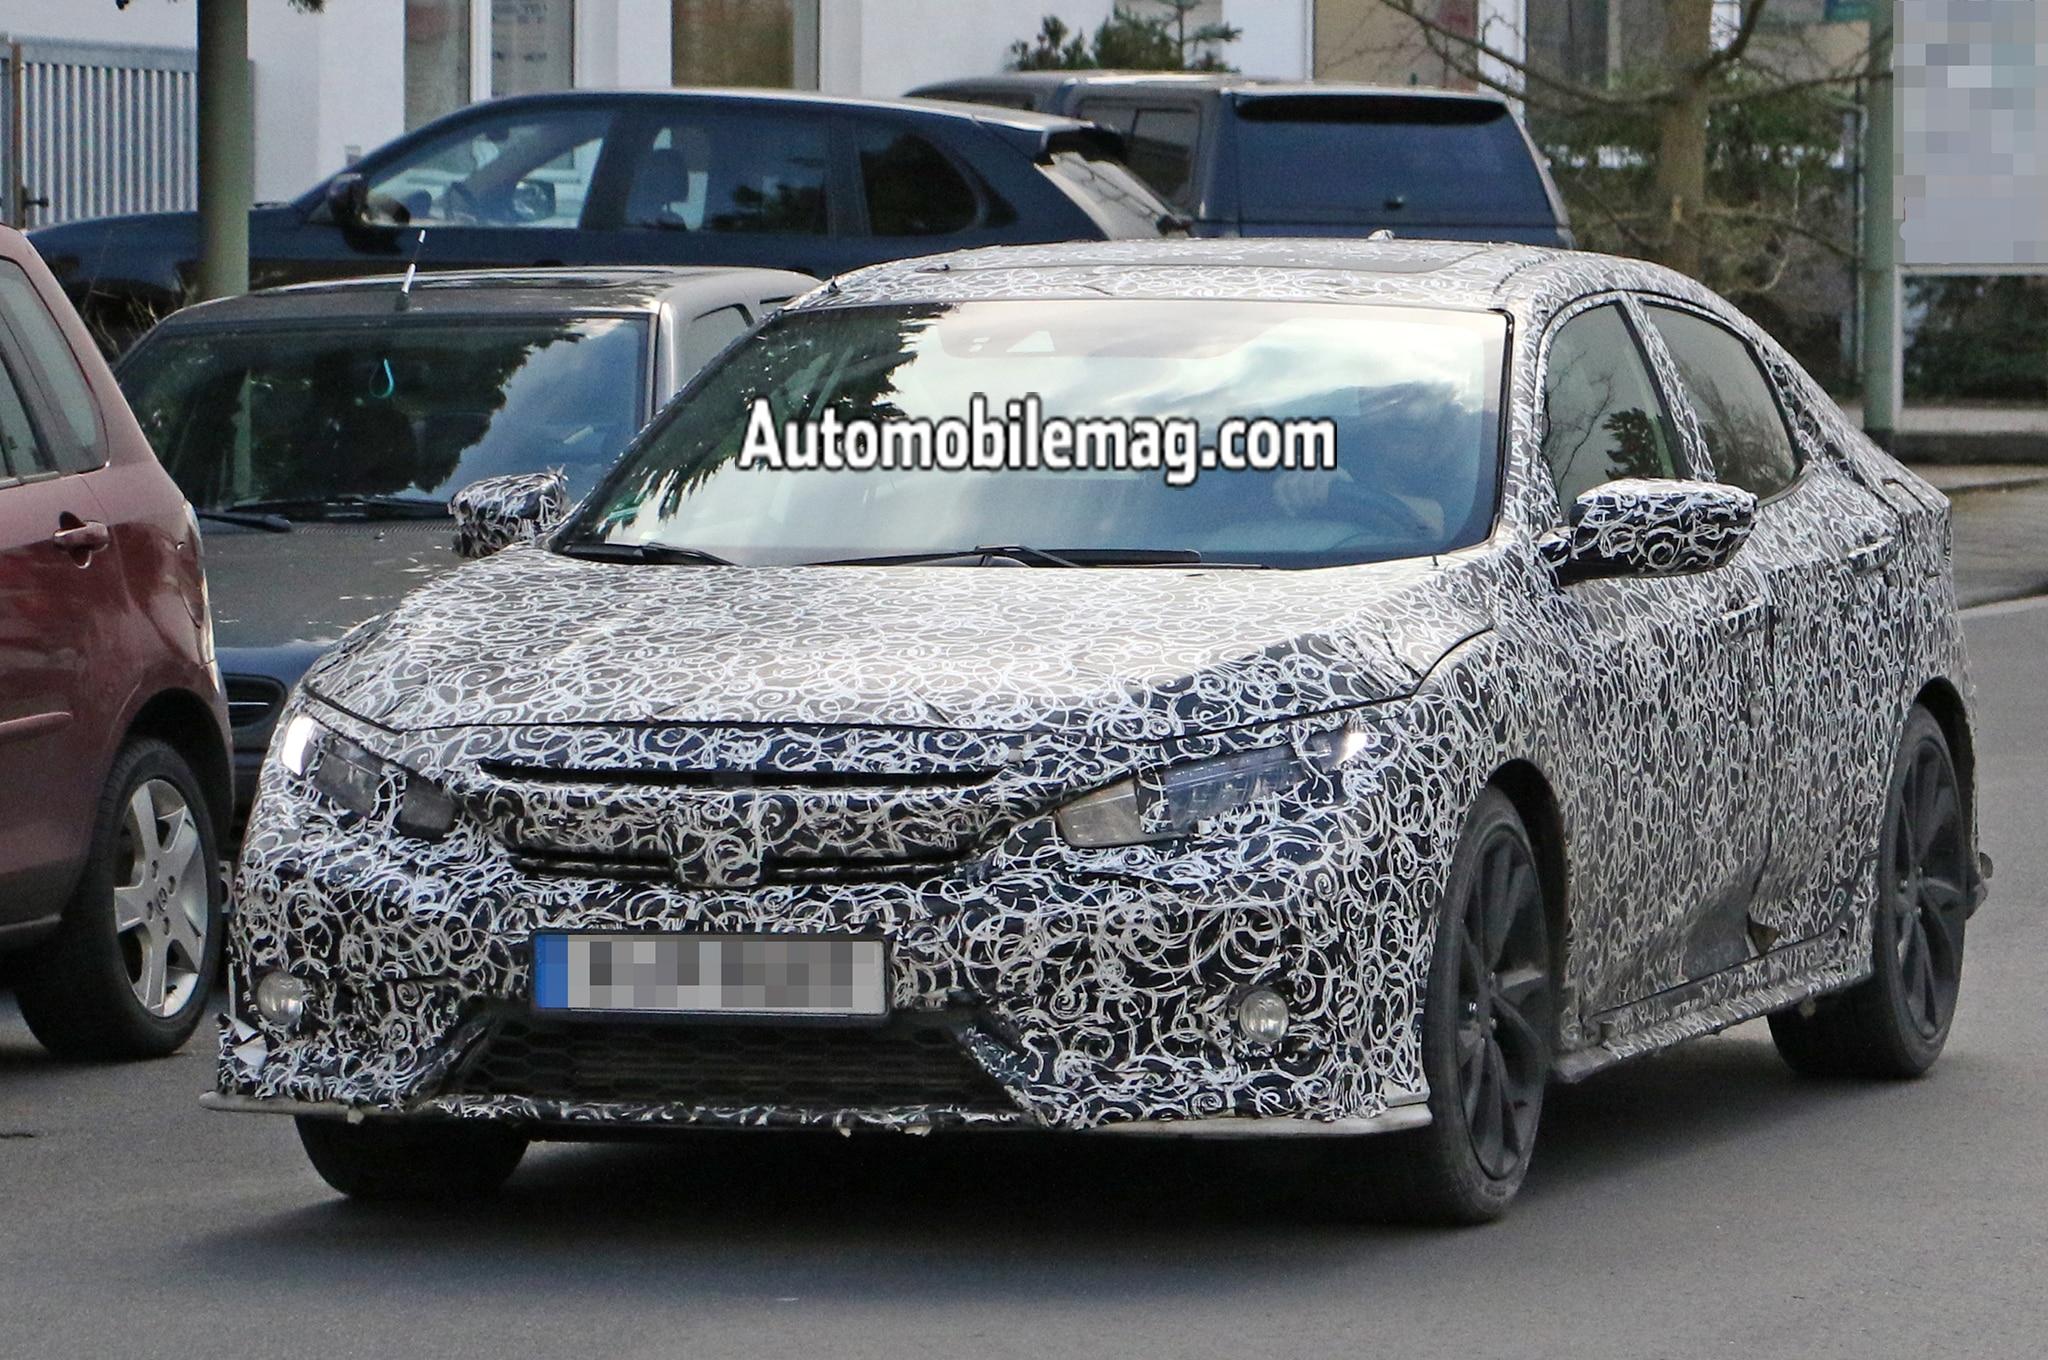 10th Generation Civic Exclusive Pakistan Launch - Honda Civic Hatch Spyshot front 2?interpolationlanczos none